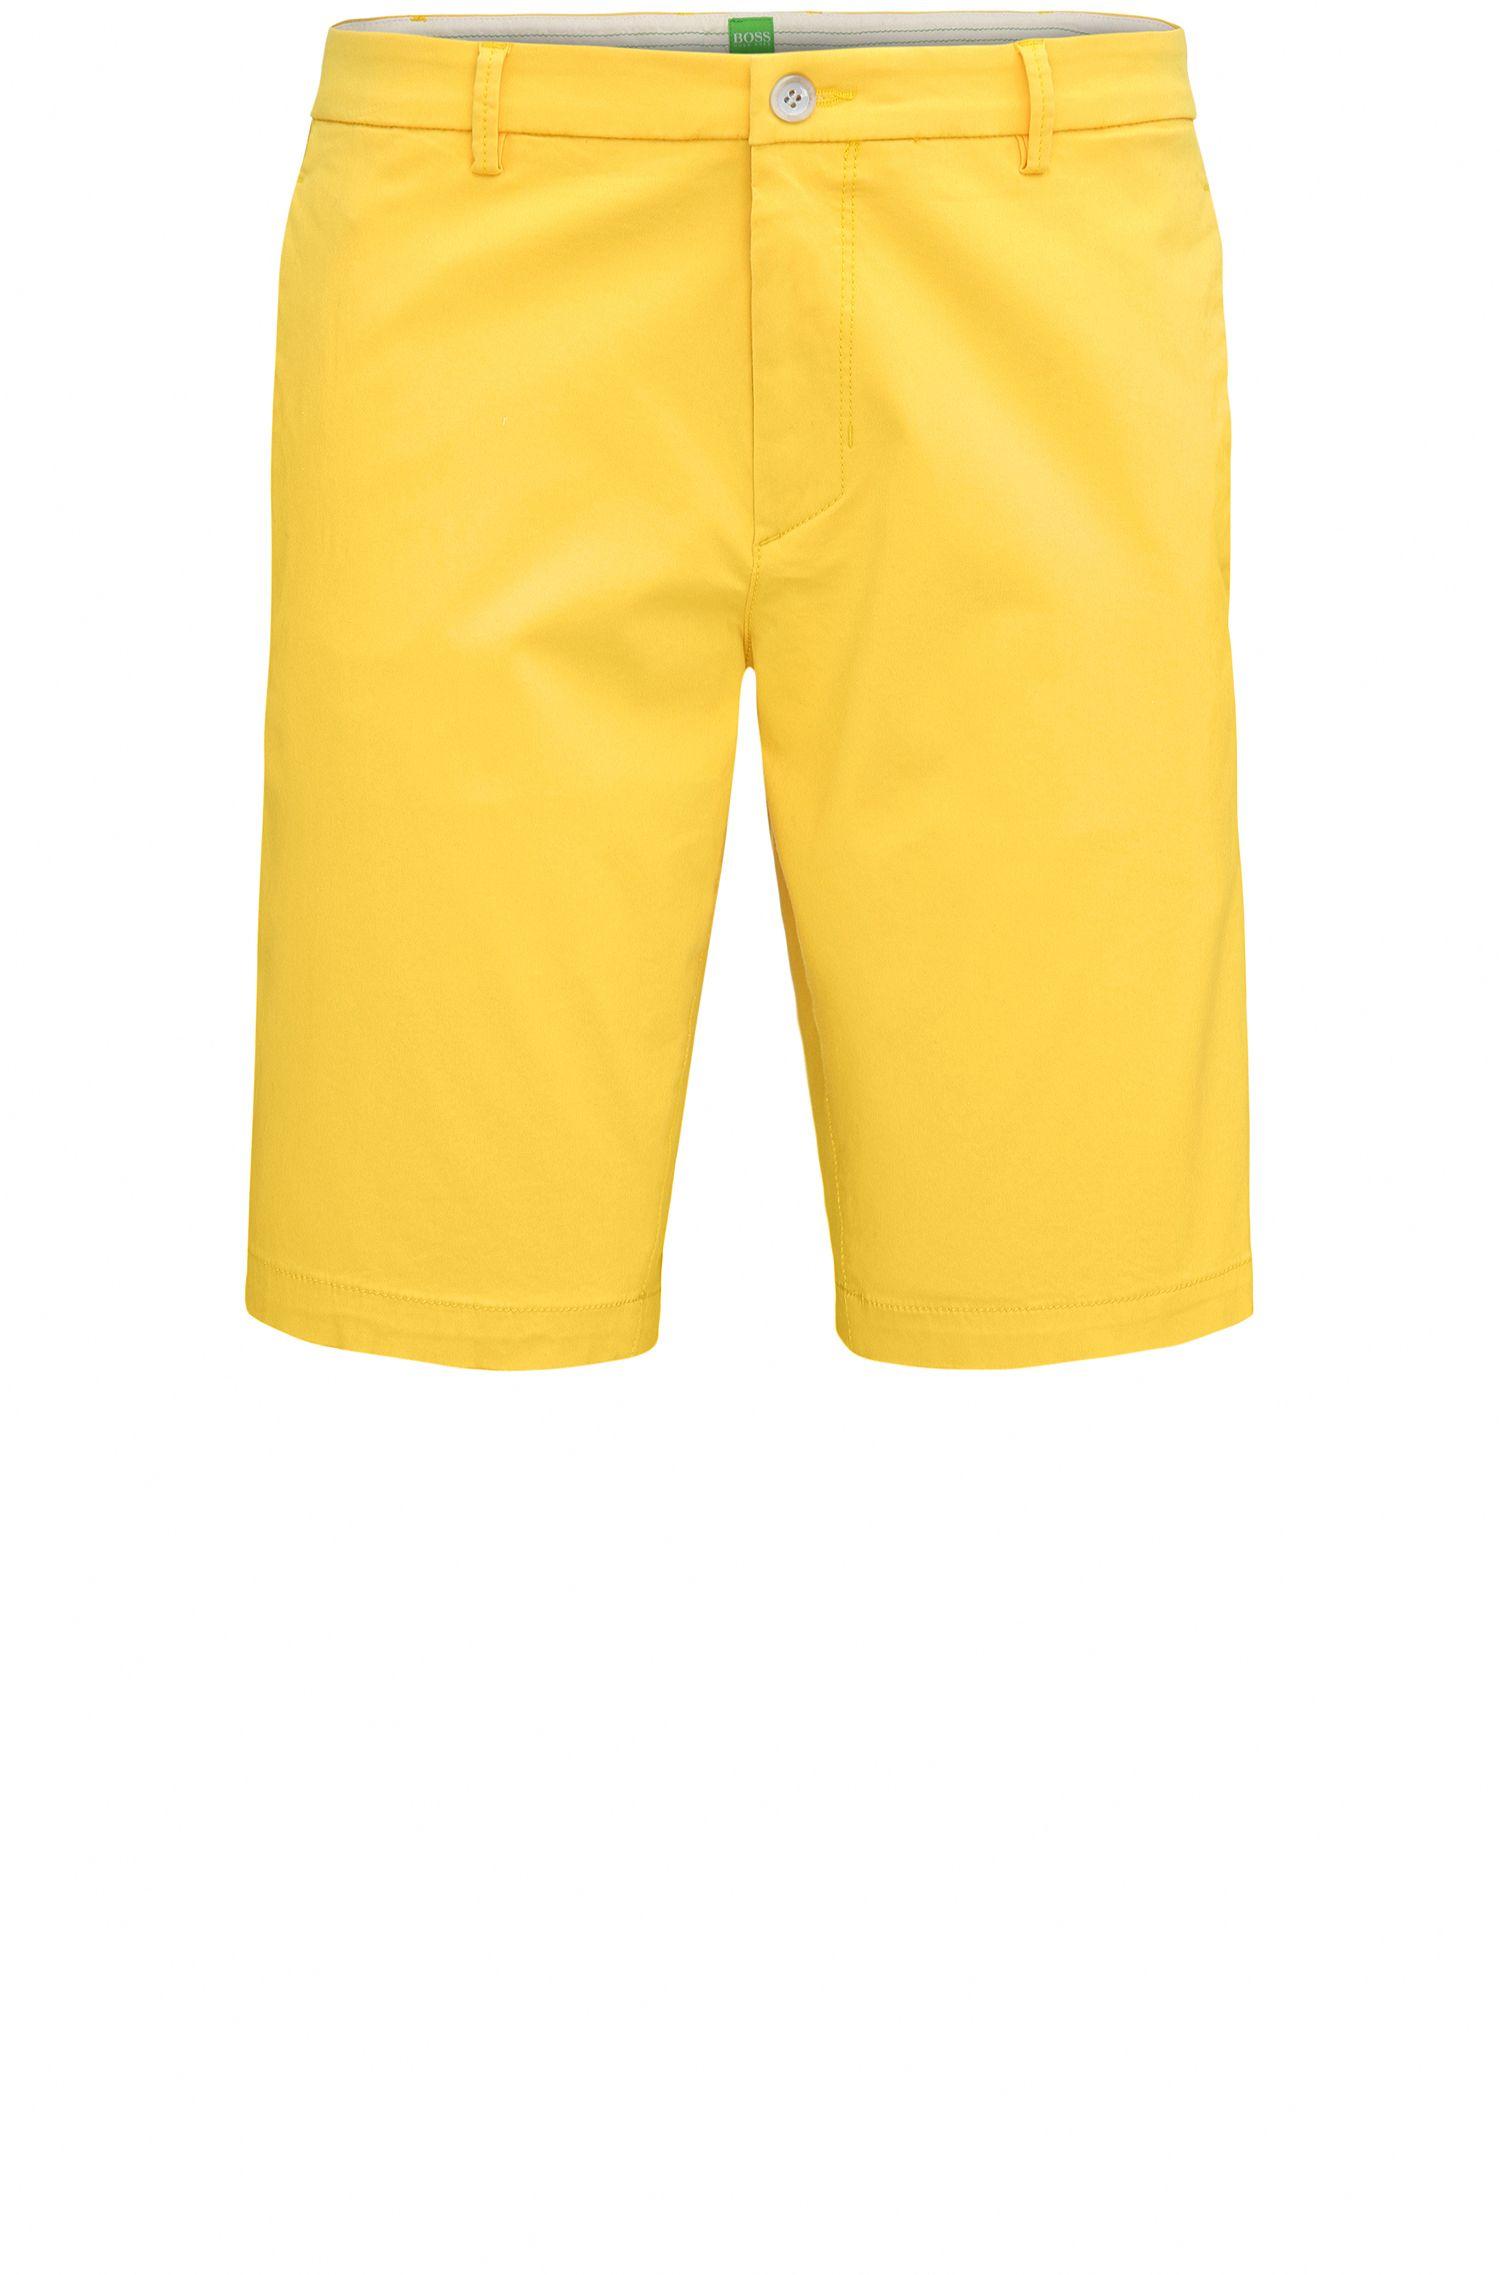 'Liem' | Slim Fit, Satin Stretch Cotton Shorts